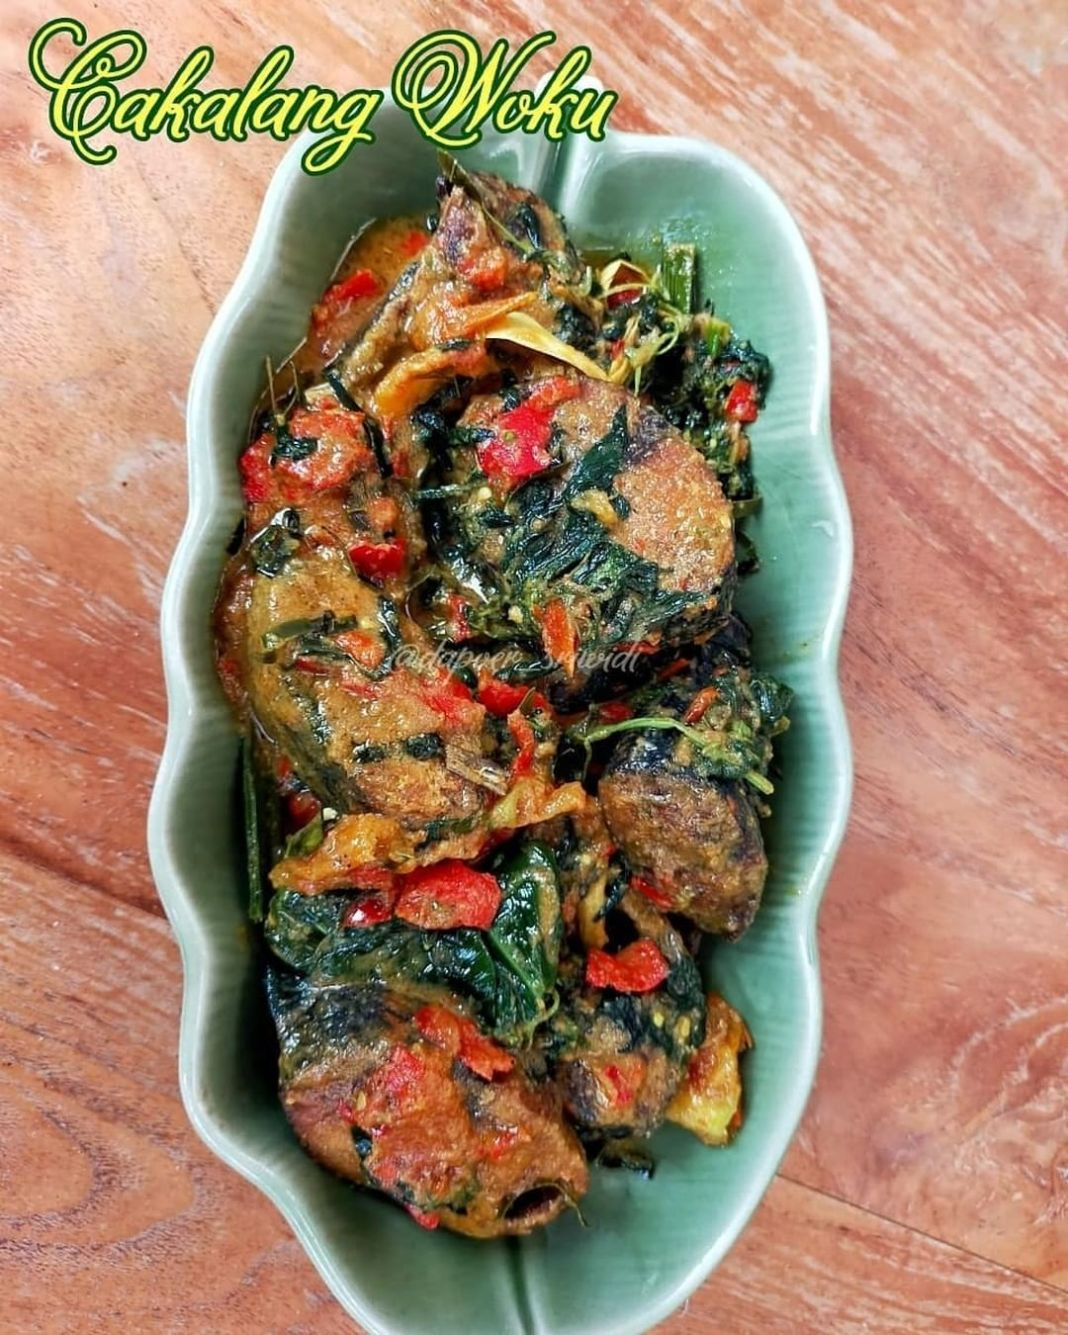 Info kuliner, Sore moms bikin cakalang woku, bikin boros nasi   Cakalang Woku ala@dapoer_sriwidi  Bahan : 2 …